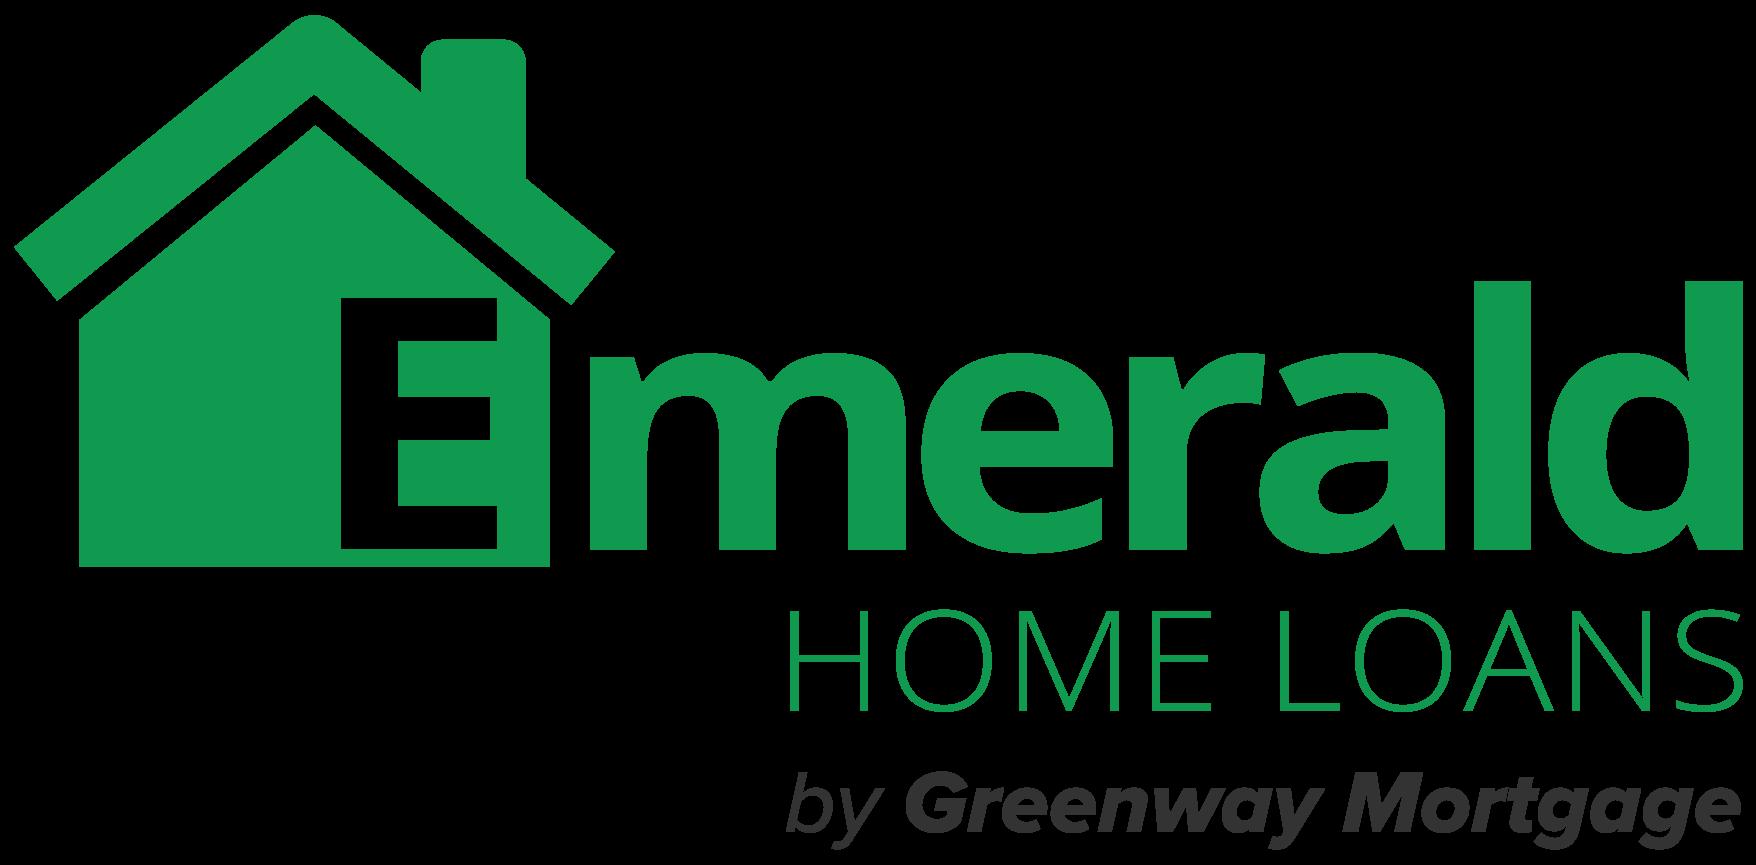 Emerald Home Loans